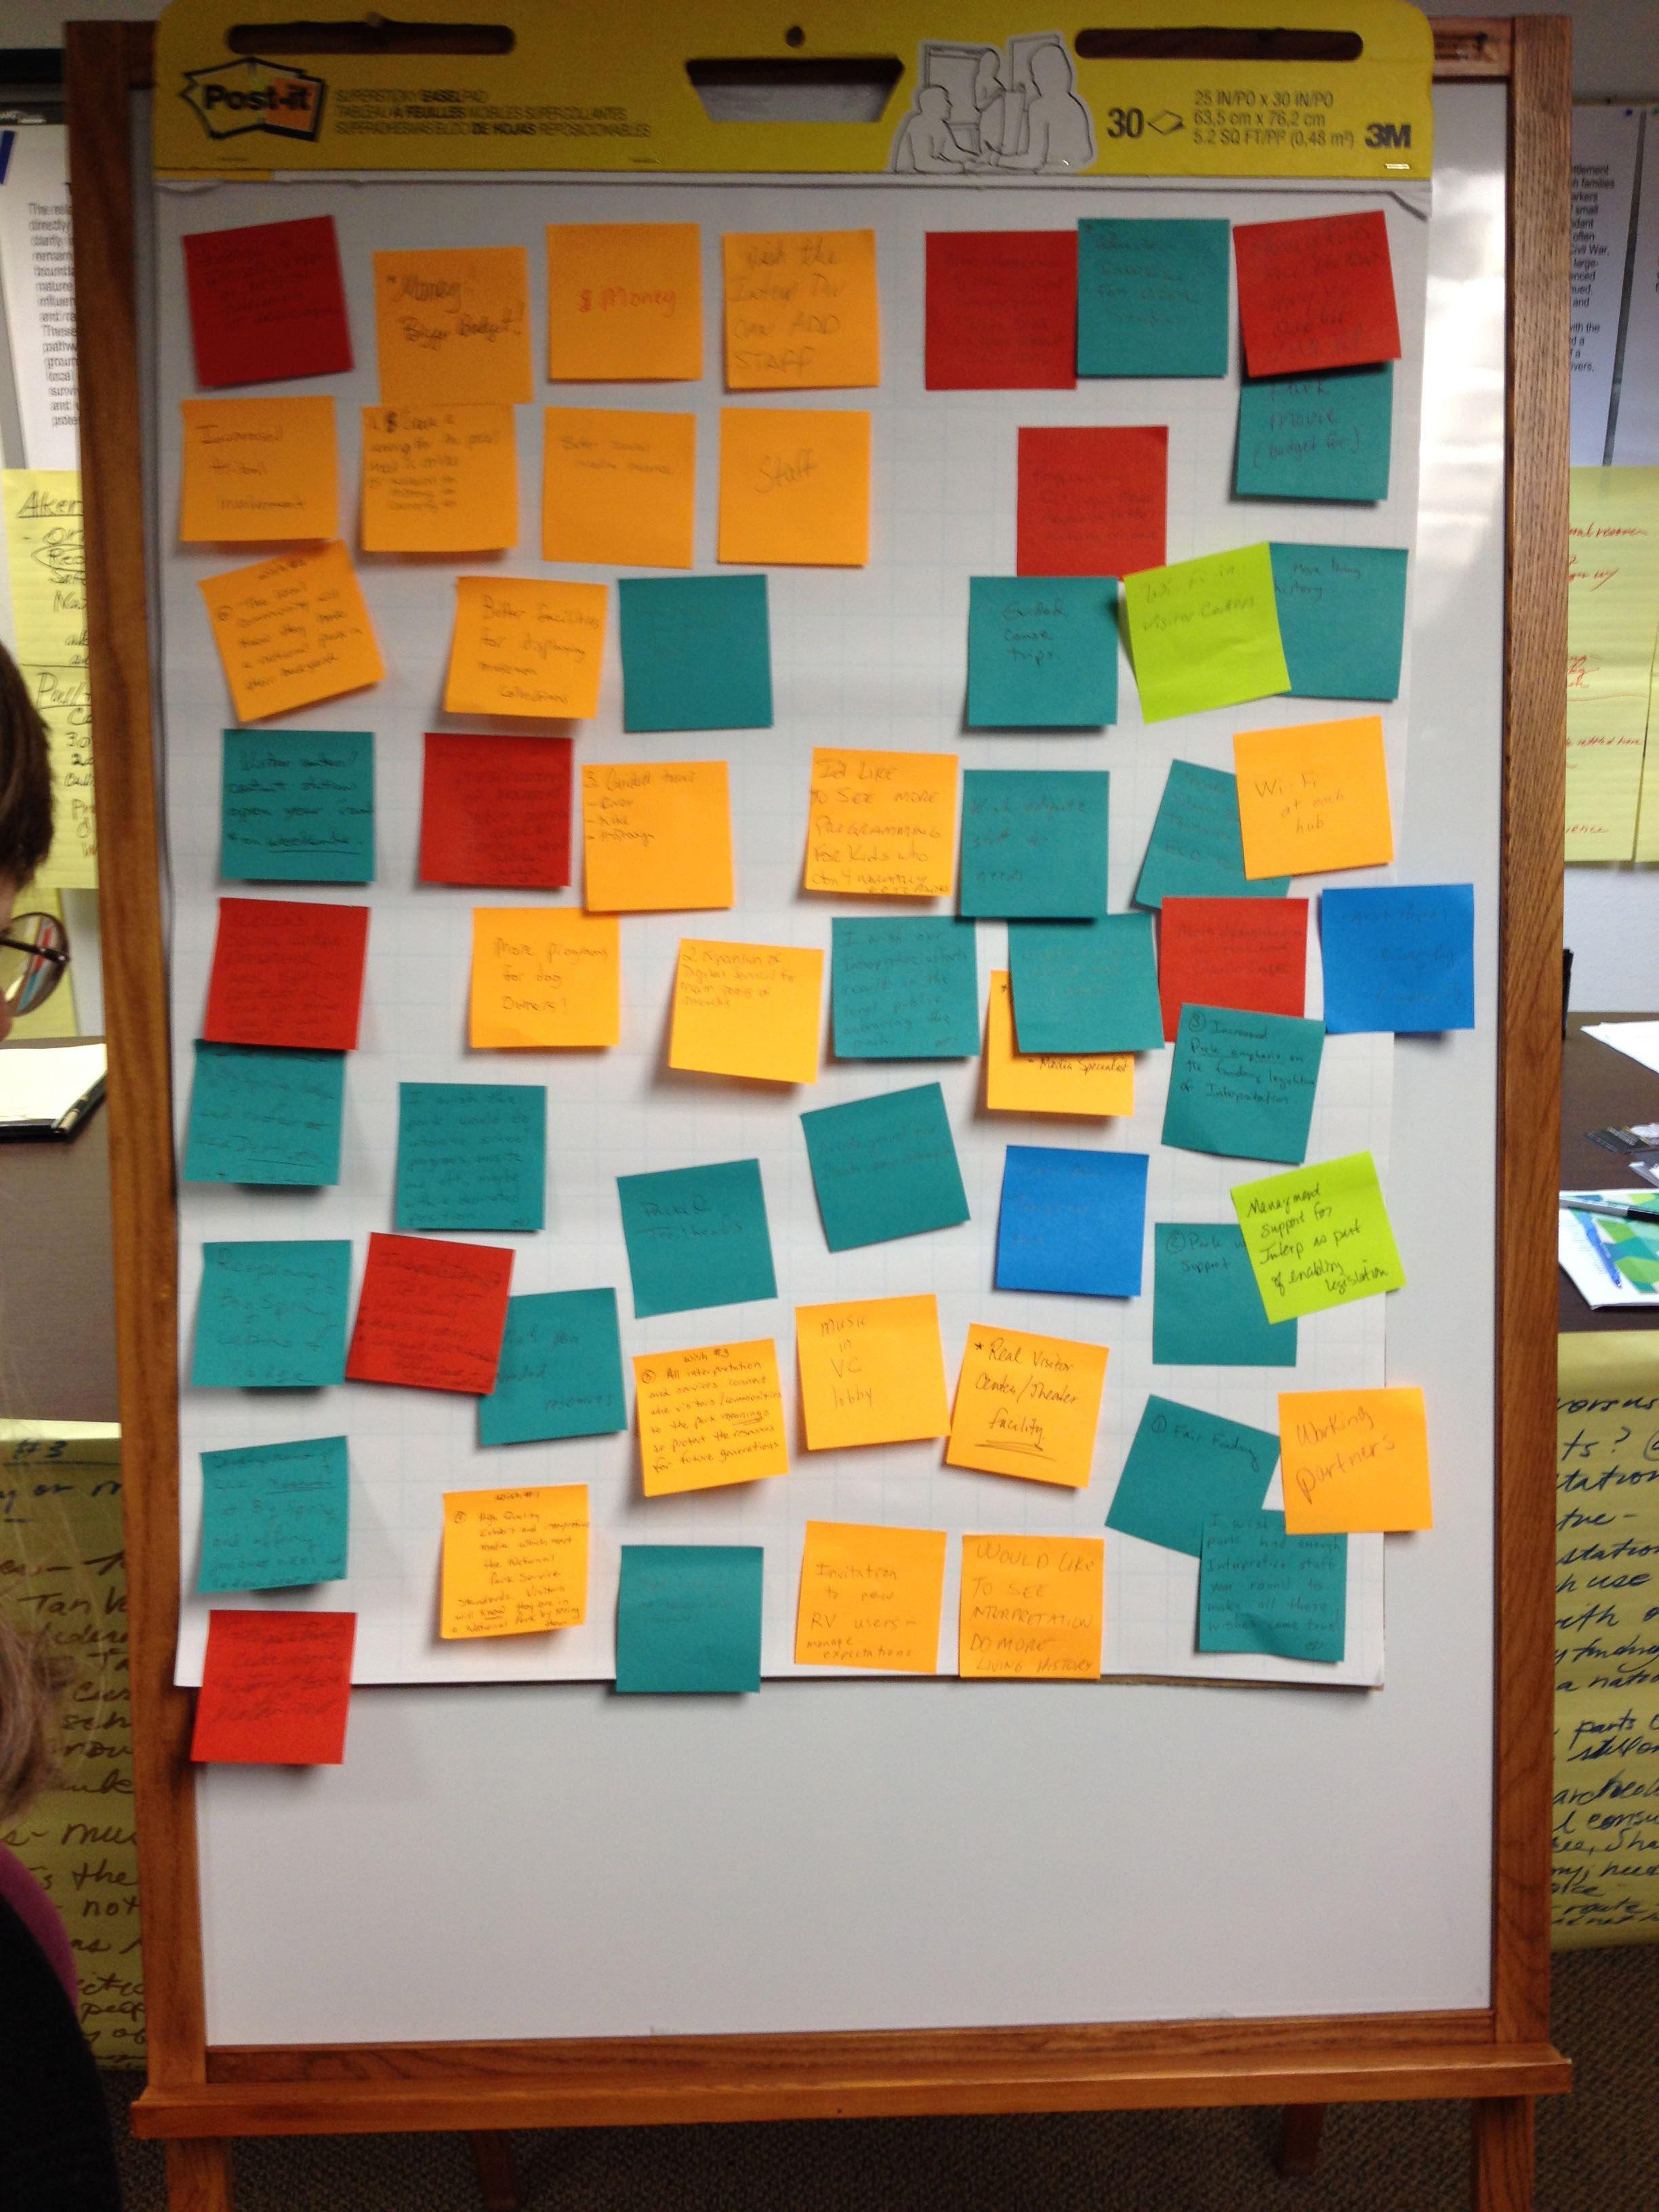 User interface development workshop